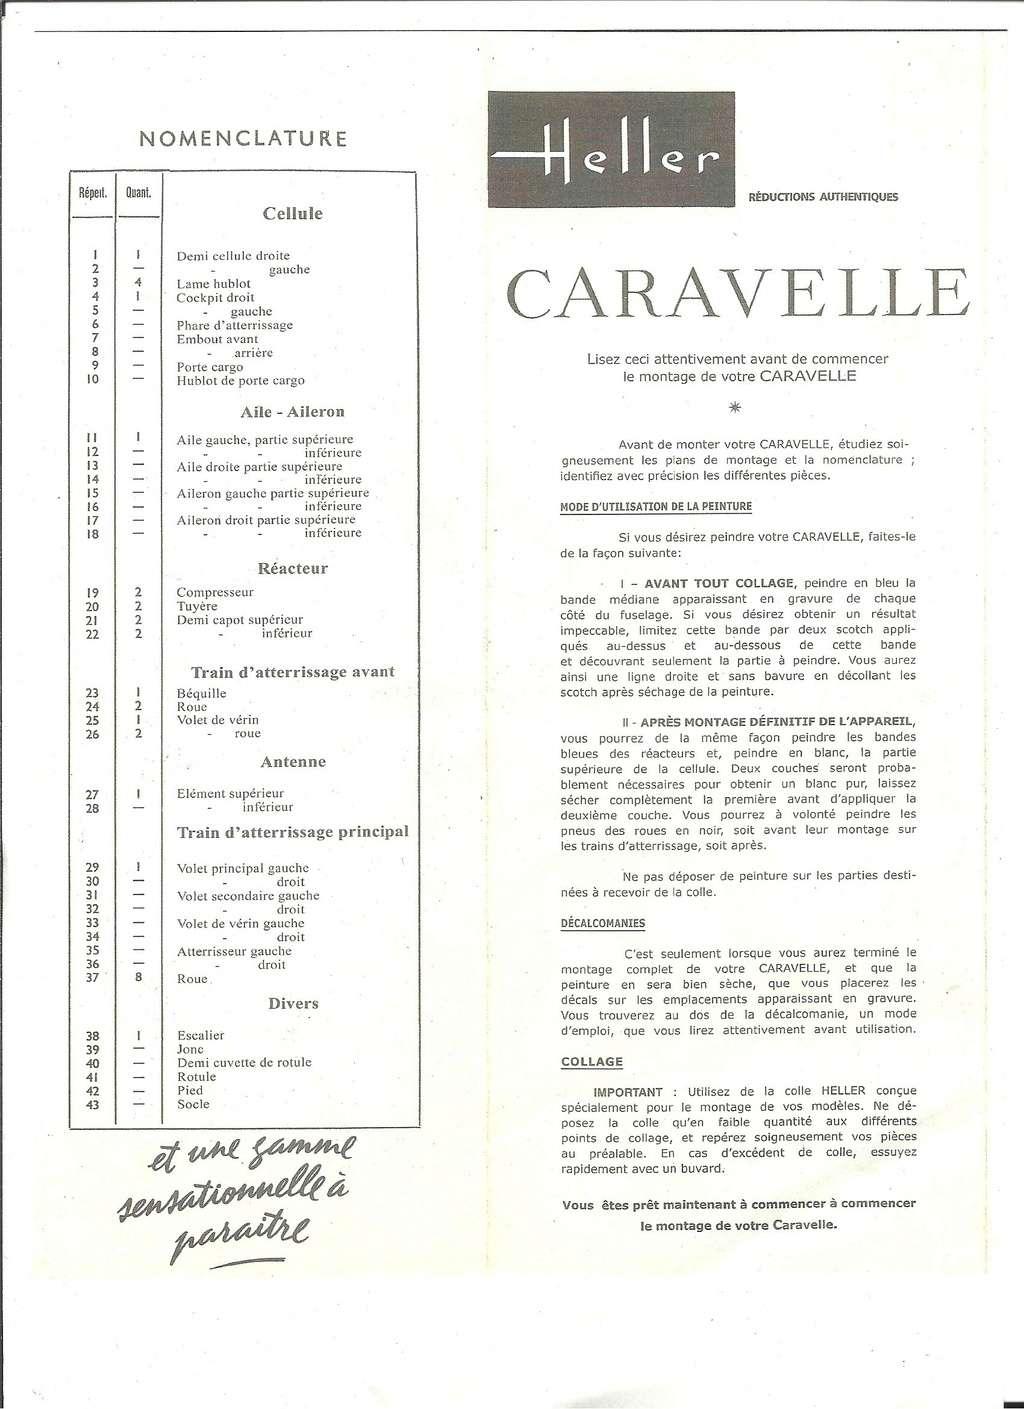 SUD AVIATION SE 210 CARAVELLE 1/100ème Réf RL318 Notice Helle587